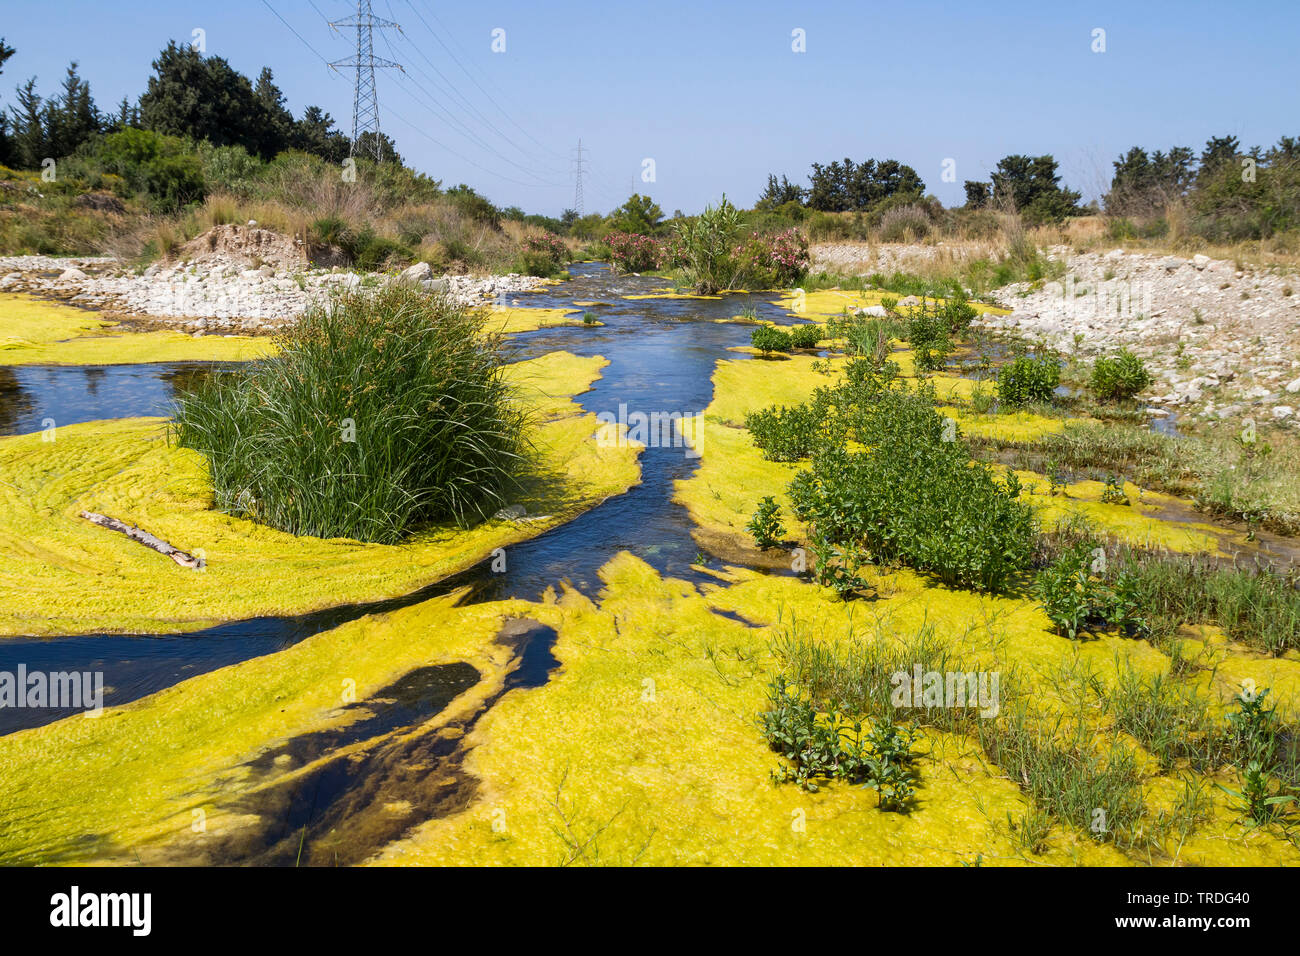 Verschmutzter, mit Algen bewachsener Fluss, Zypern | río eutróficos en Chipre, Chipre | BLWS503041.jpg [ c)/blickwinkel GAAM/R. Martin Tel. +49 (0) Foto de stock